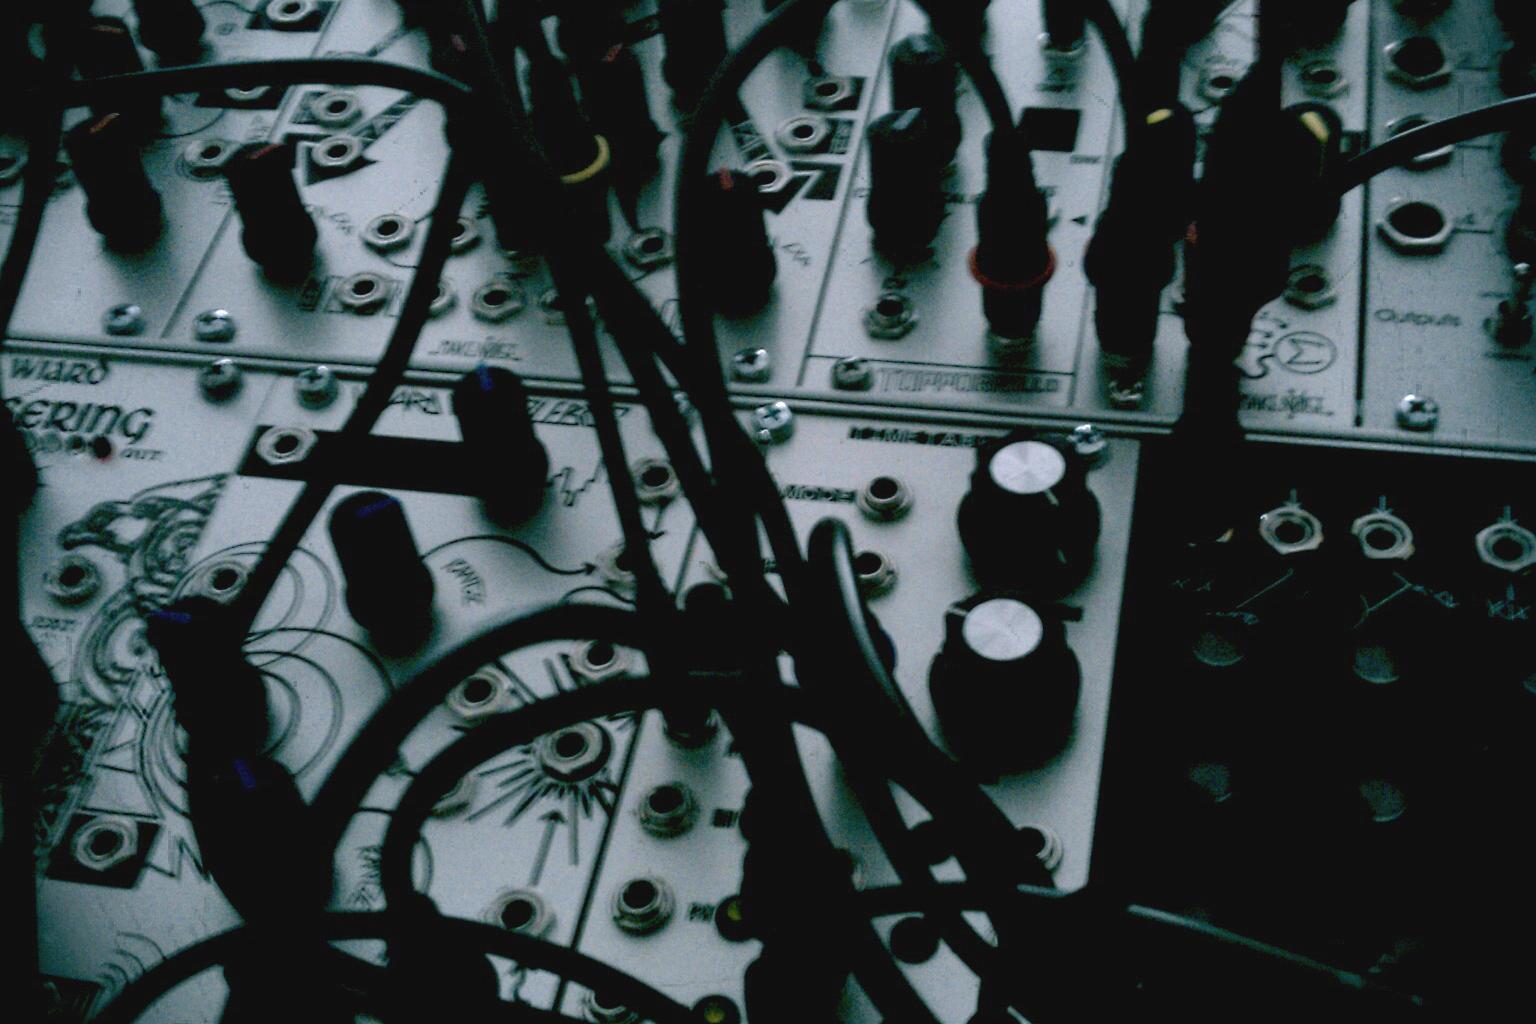 Nils Quak - Moiré / Braille, closeup of modular analogue synth